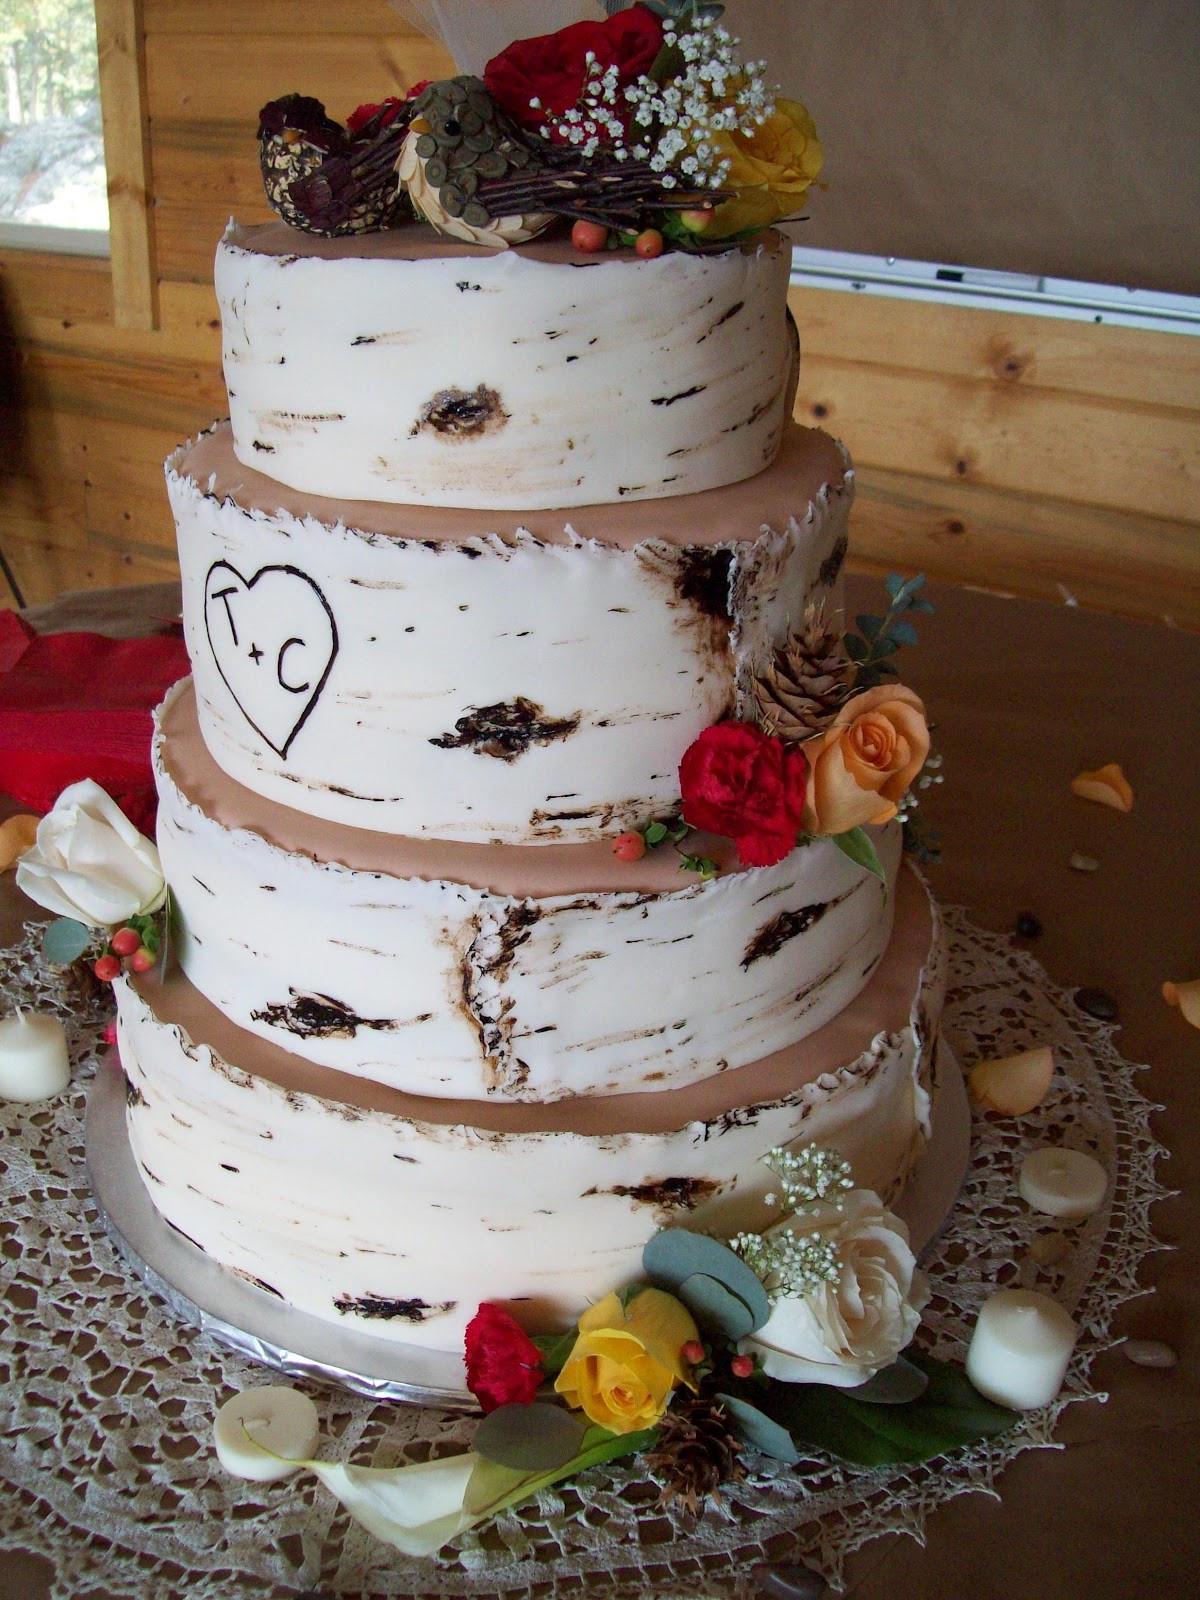 Cheesecake Wedding Cakes  The Frosting Posey Aspen Wedding Cake